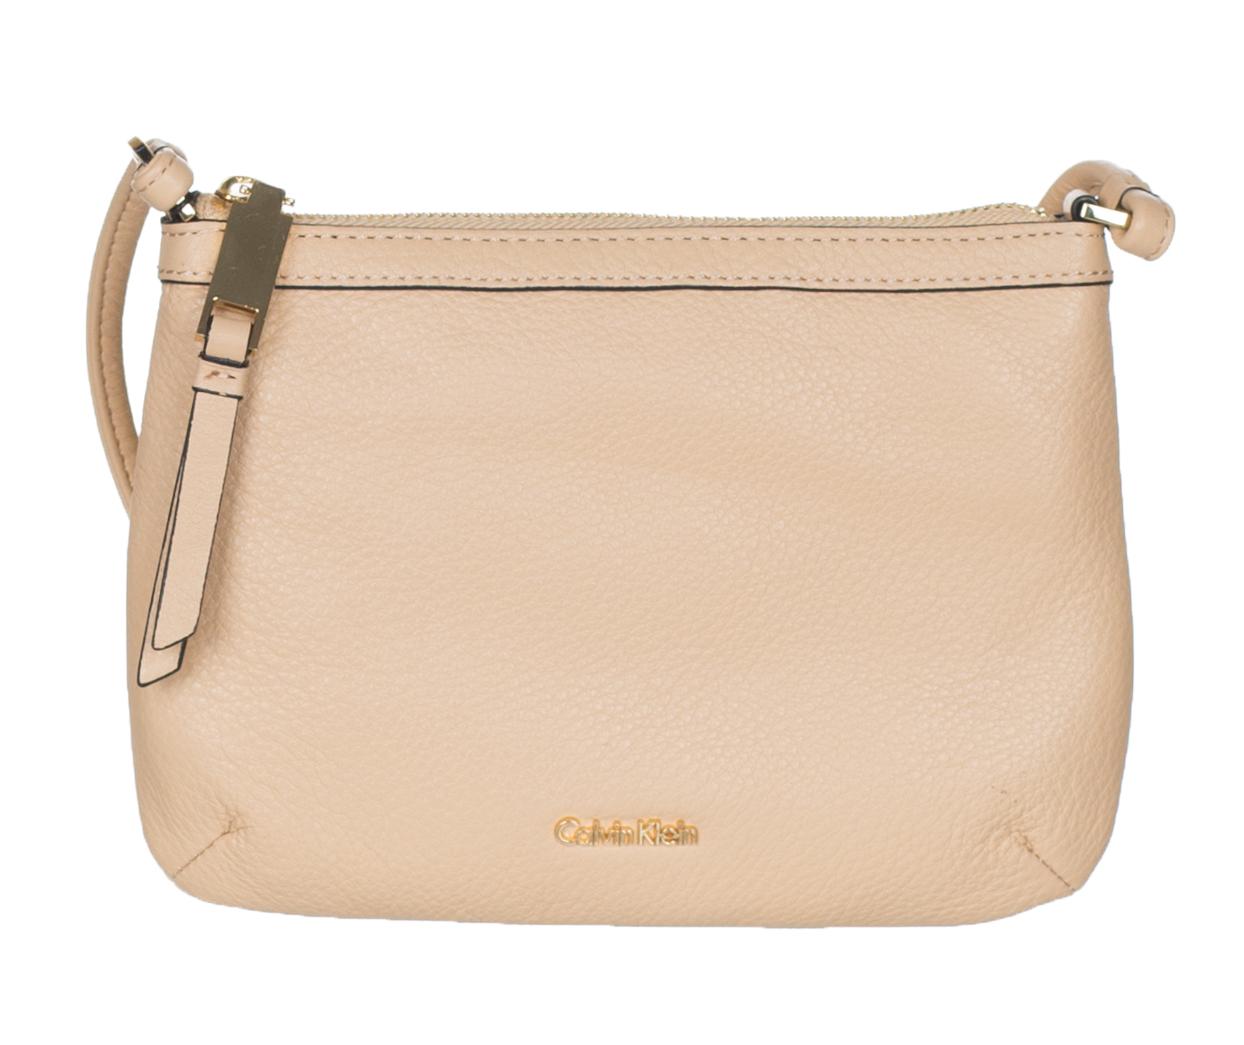 270718d67 Calvin Klein Women's Beige Pebble Leather Carrie Crossbody Bag